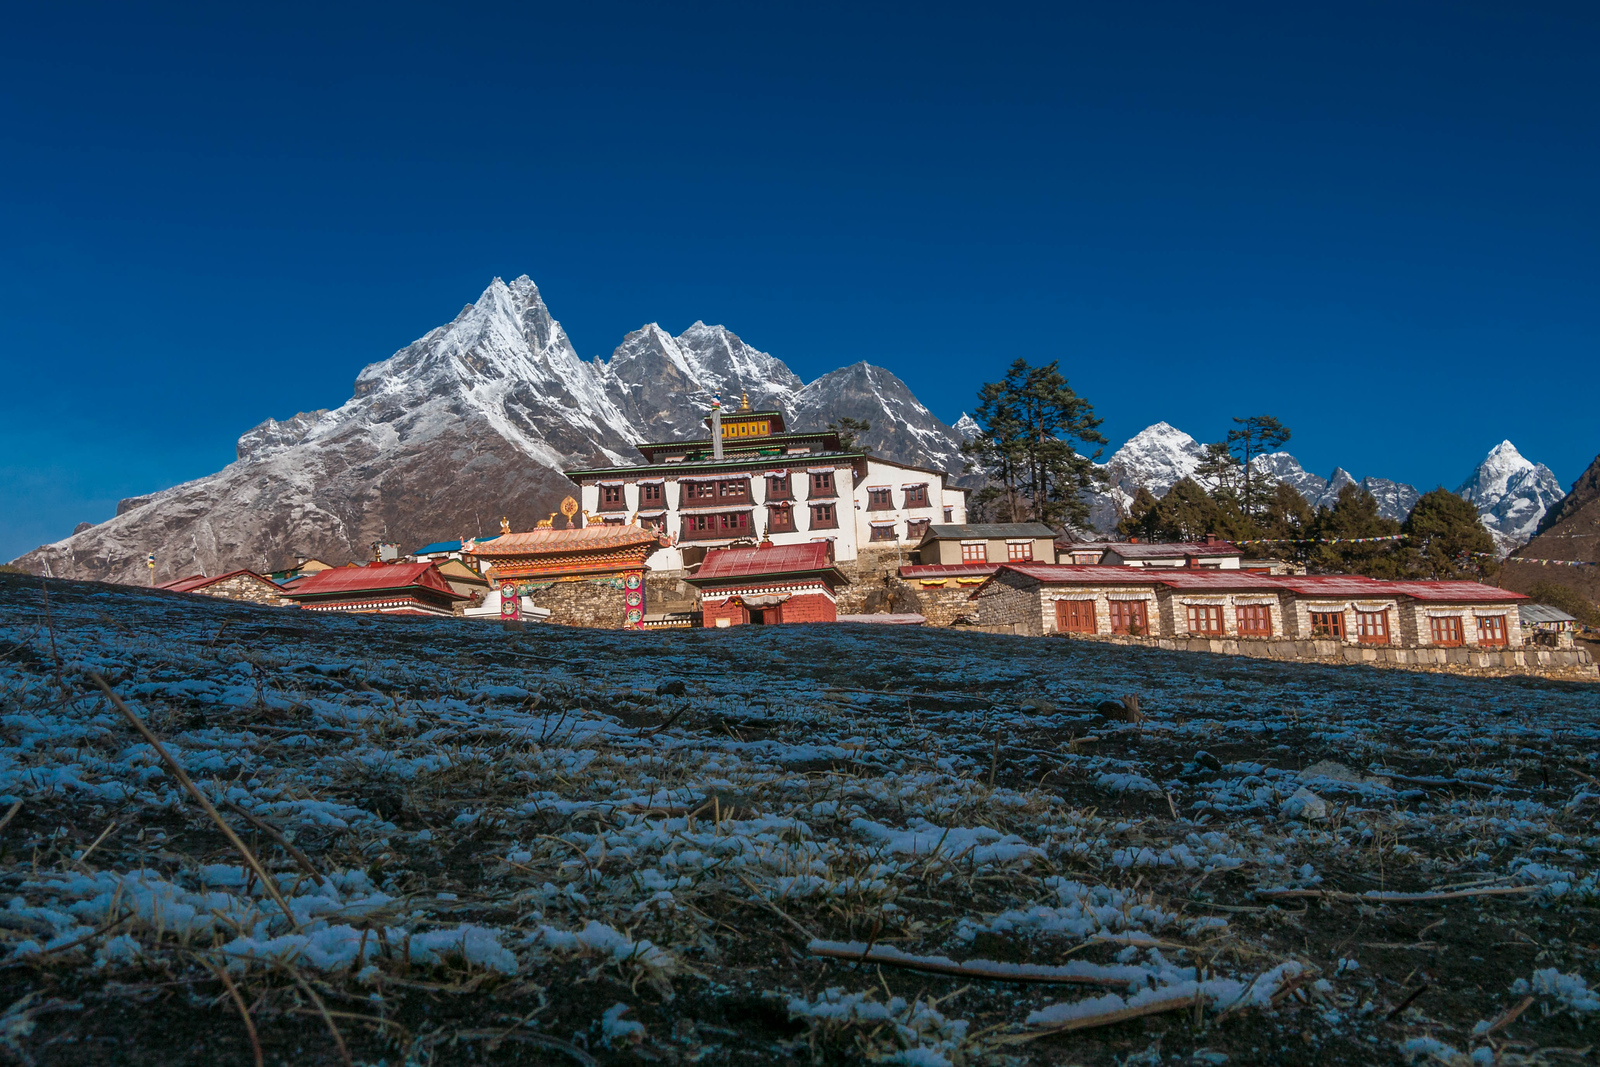 The Tengboche Monastery.